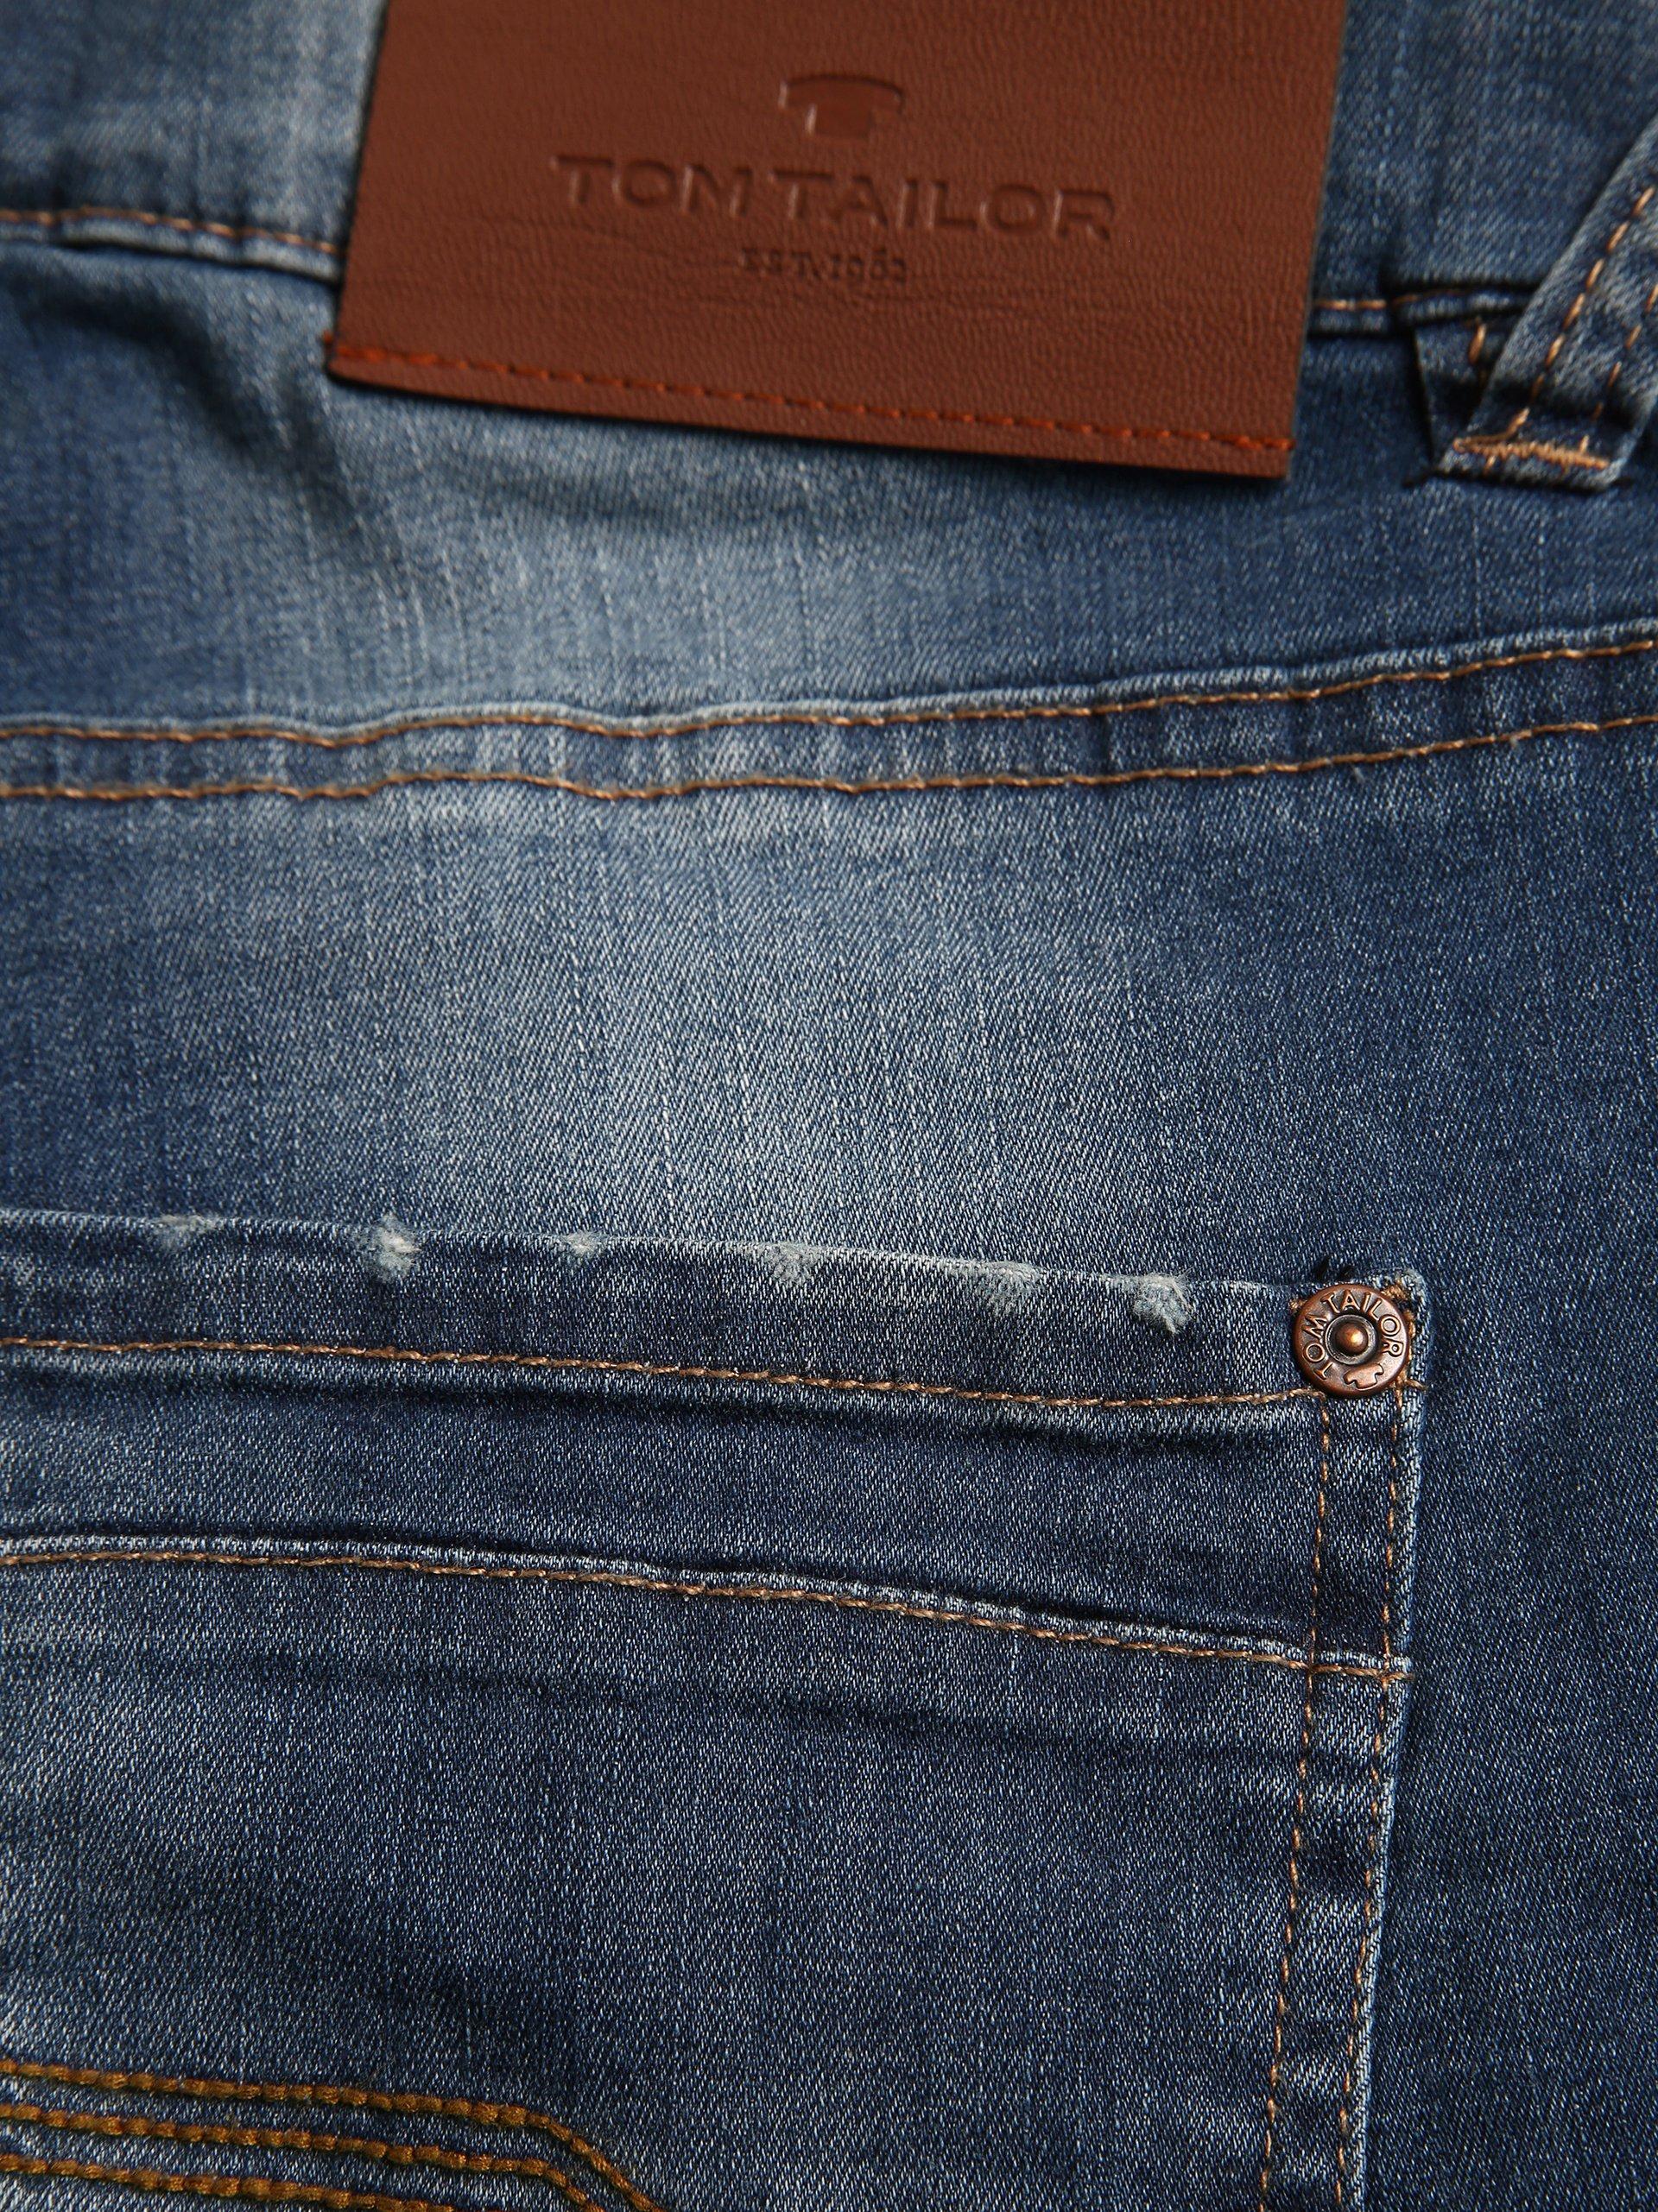 Tom Tailor Mädchen Jeans Tight Fit - Ryan